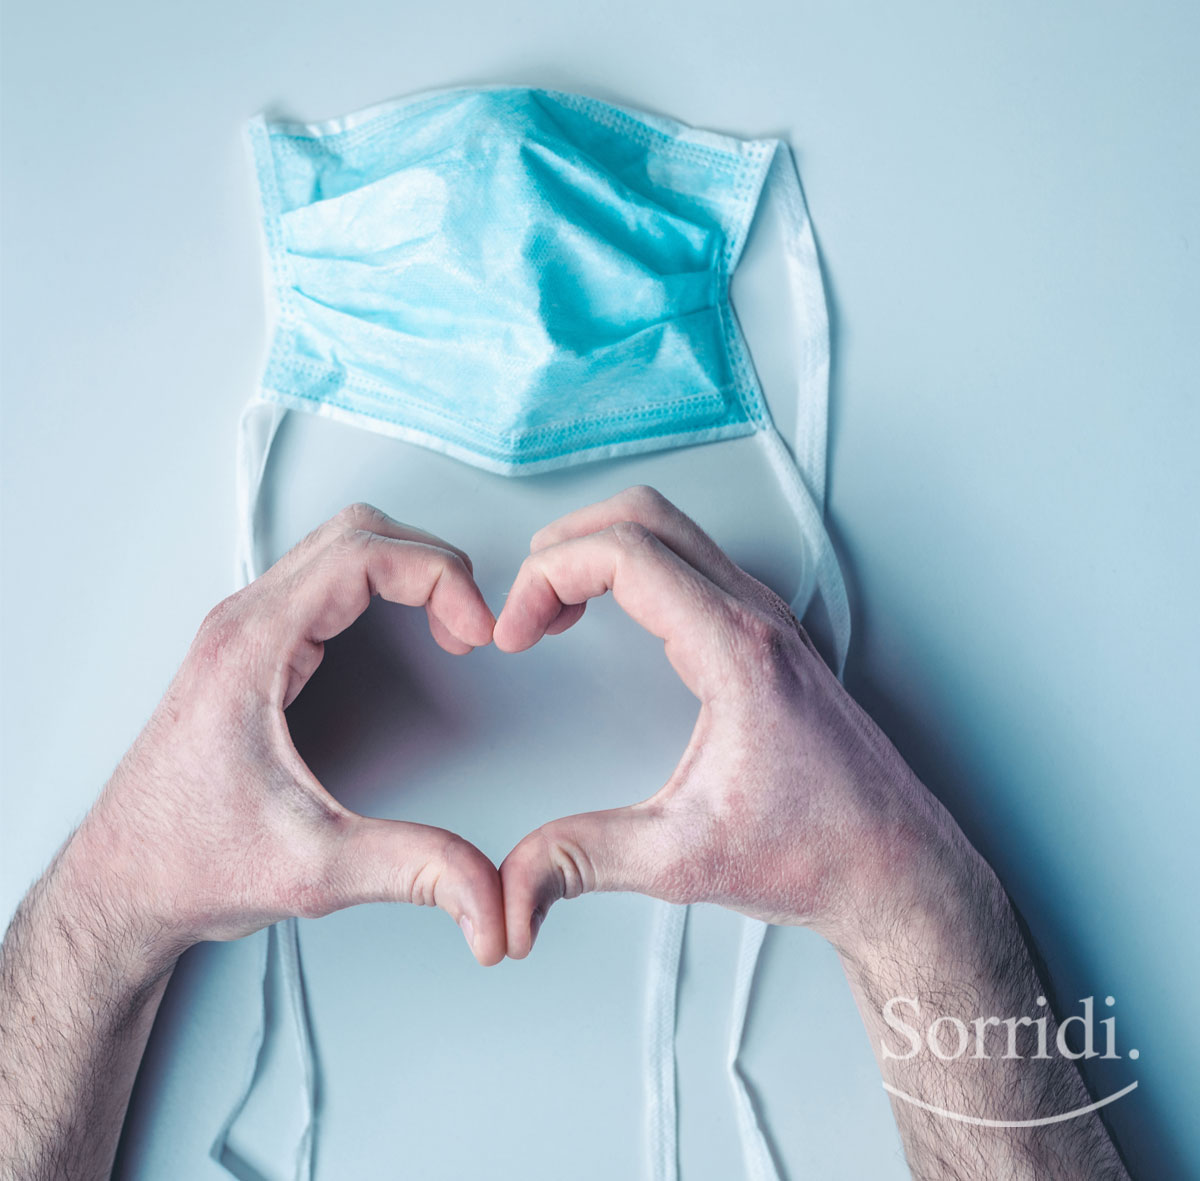 Sorridi-ch-magazine-sicurezza-studi-dentistici-fase2